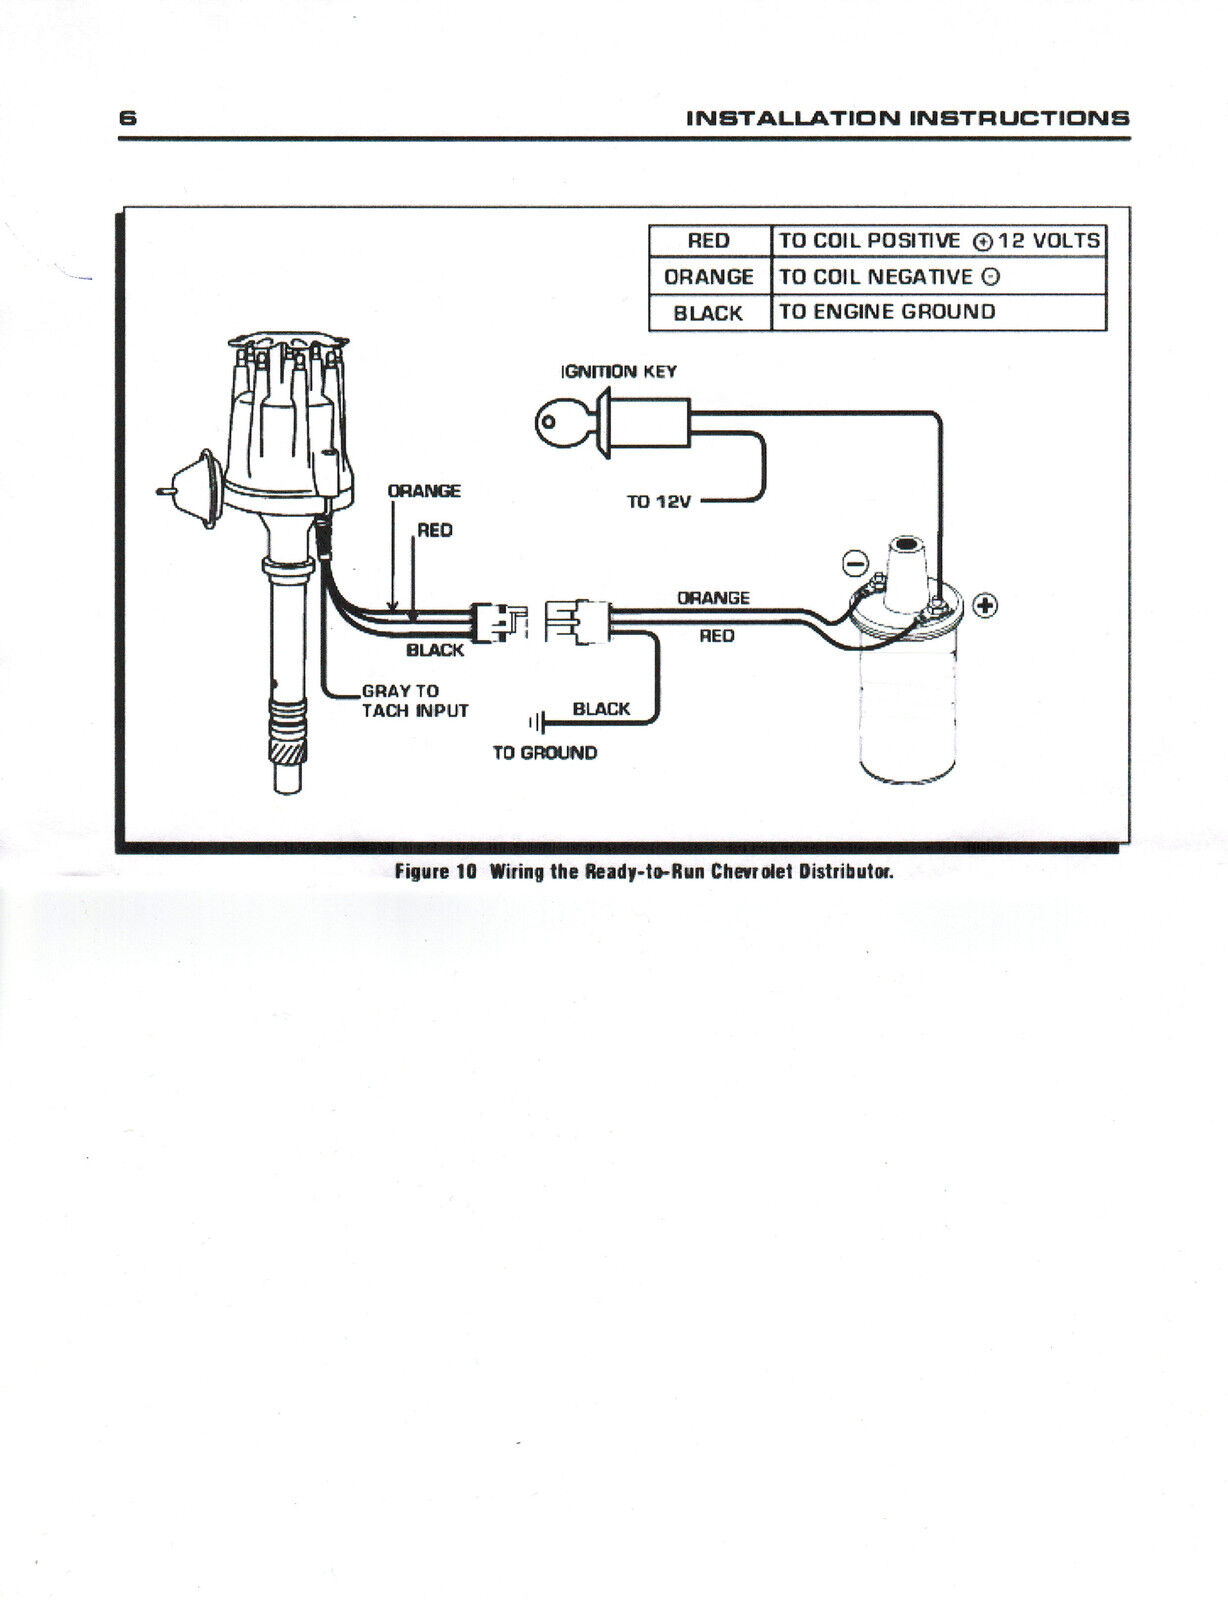 Wiring Schematics Ssv Works Bookmark About Diagram Pro Comp Data Blog Rh 8 15 Schuerer Housekeeping De Basic Electrical Diagrams Simple